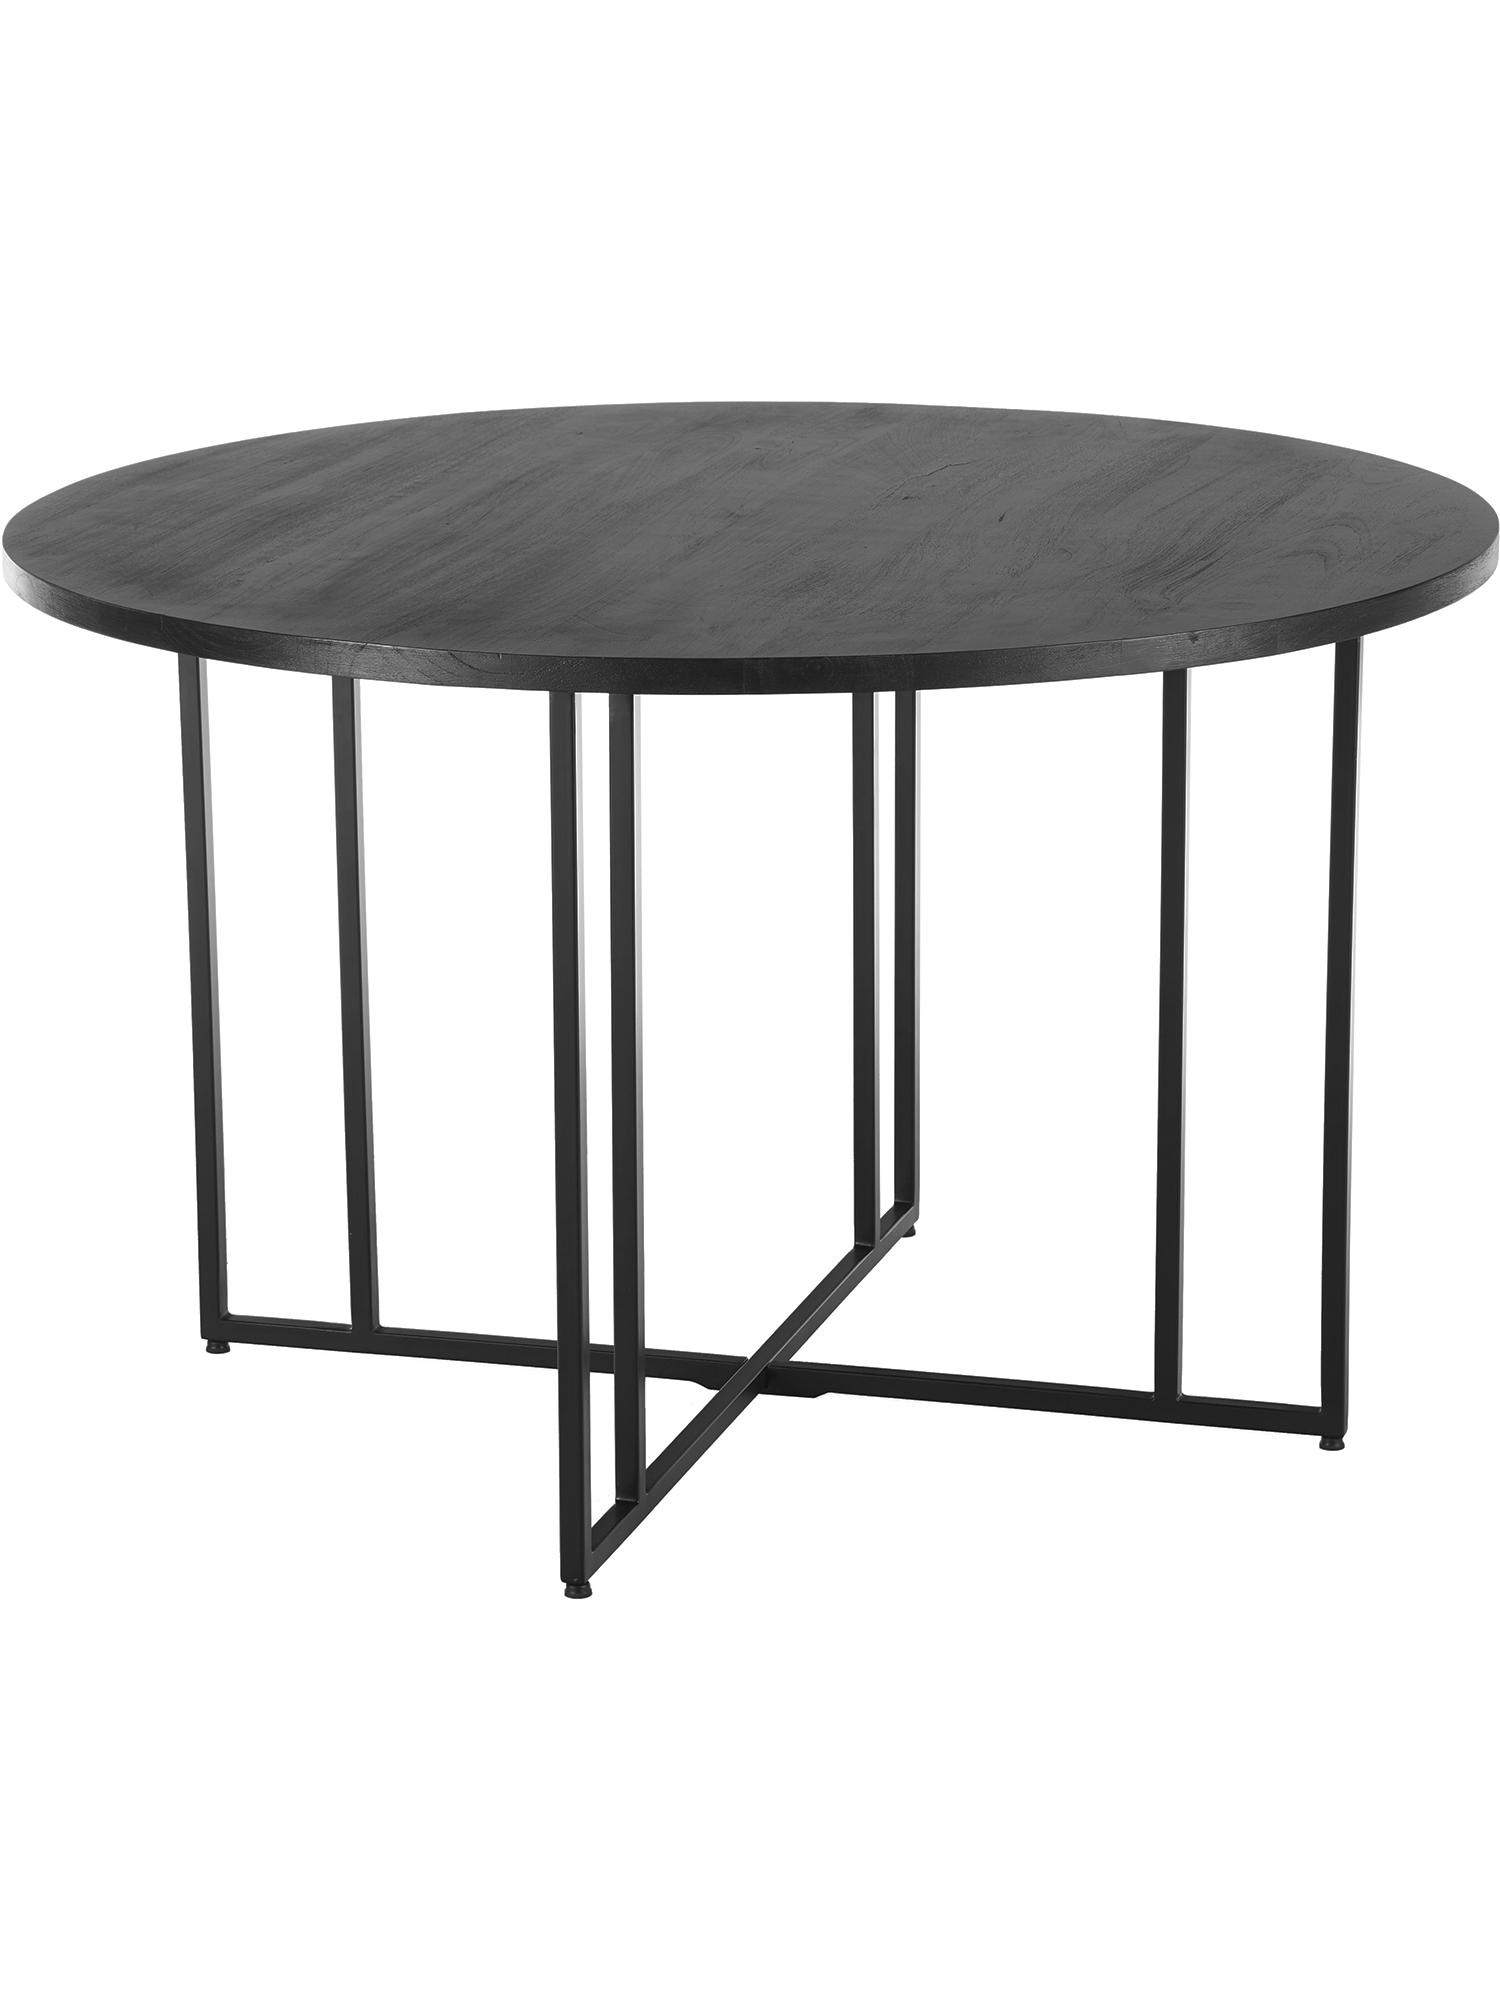 Mesa de comedor redonda de madera maciza Luca, Tablero: madera de mango maciza ce, Estructura: metal con pintura en polv, Negro, Ø 120 x Al 75 cm